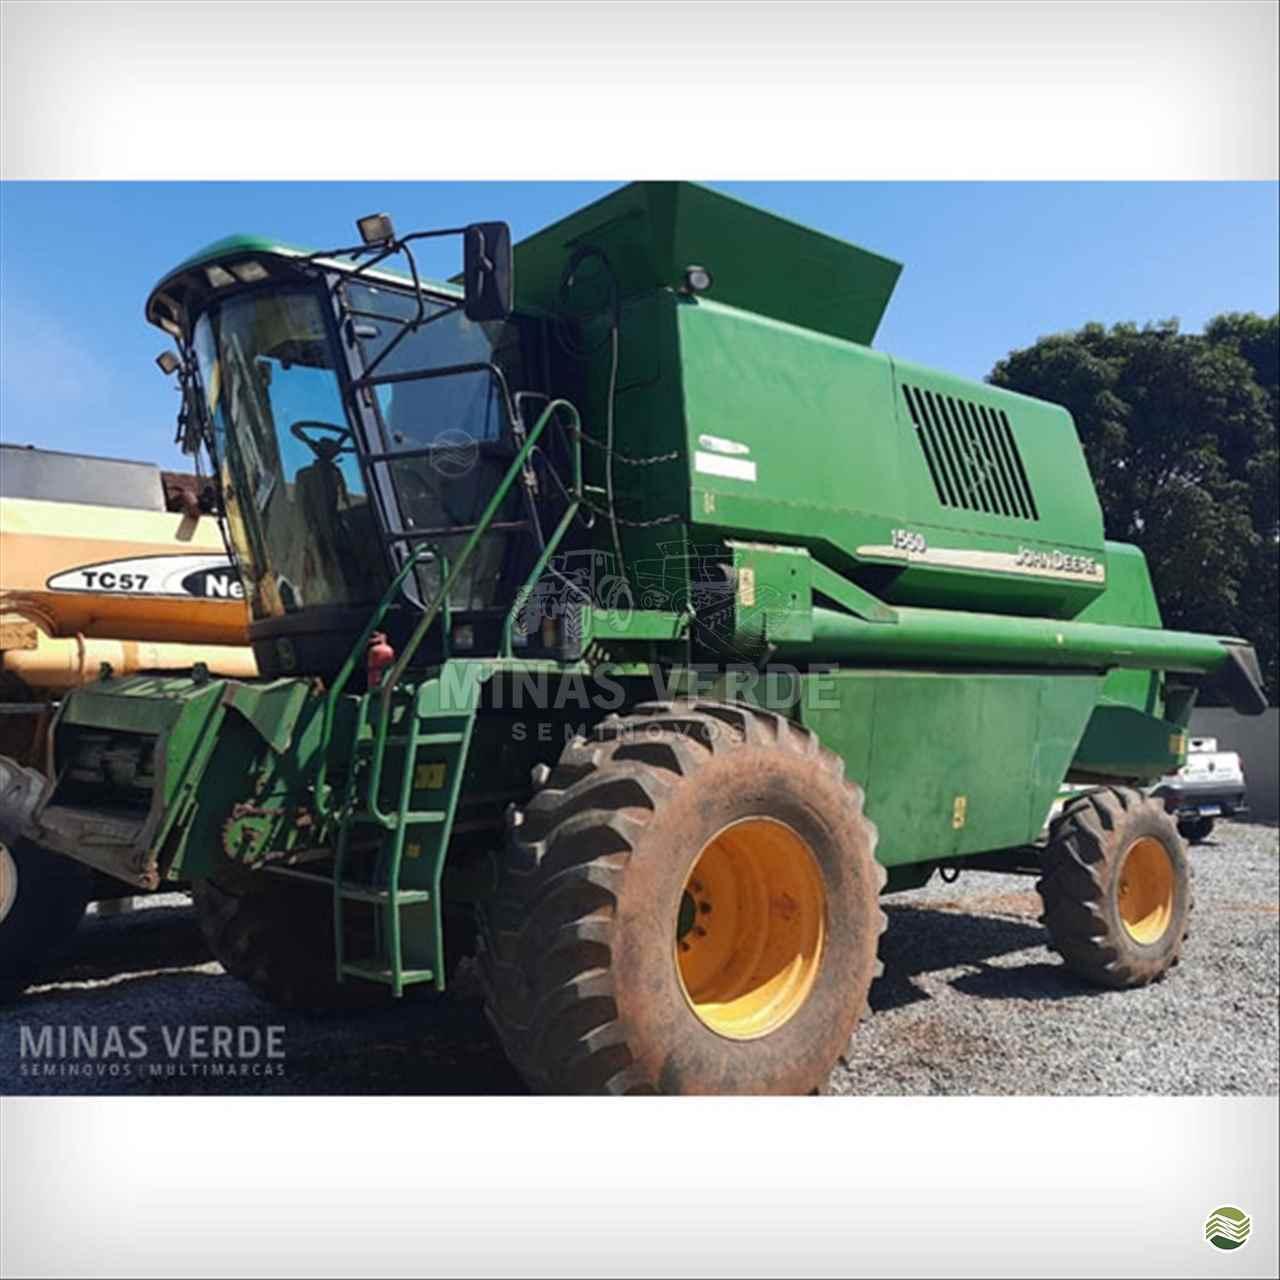 JOHN DEERE JOHN DEERE 1550  2002/2002 Minas Verde - Semi Novos